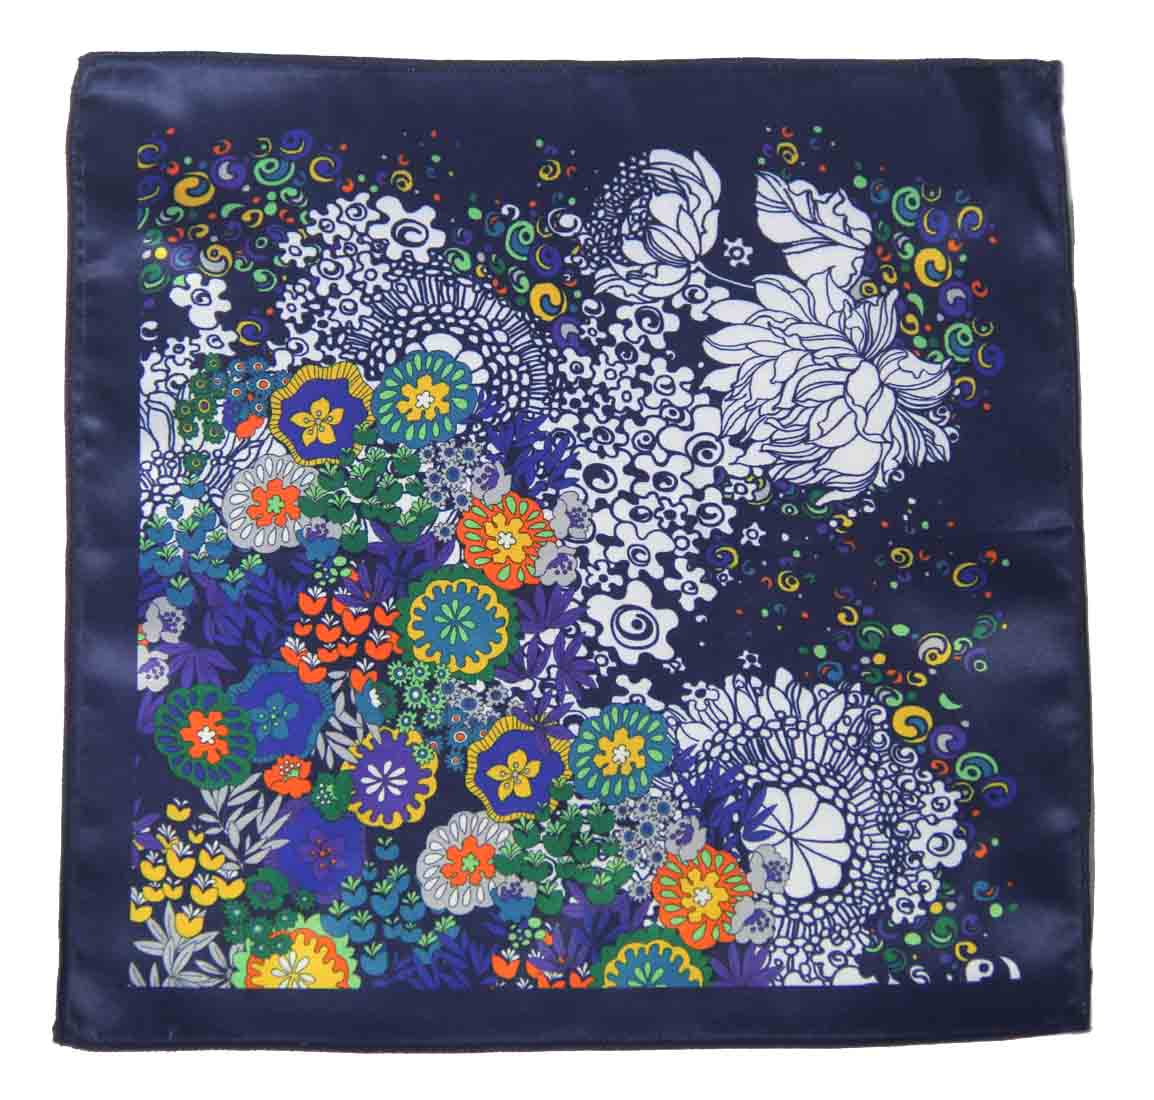 Gascoigne Silk Pocket Square Navy Blue Colorful Floral Pattern Men's